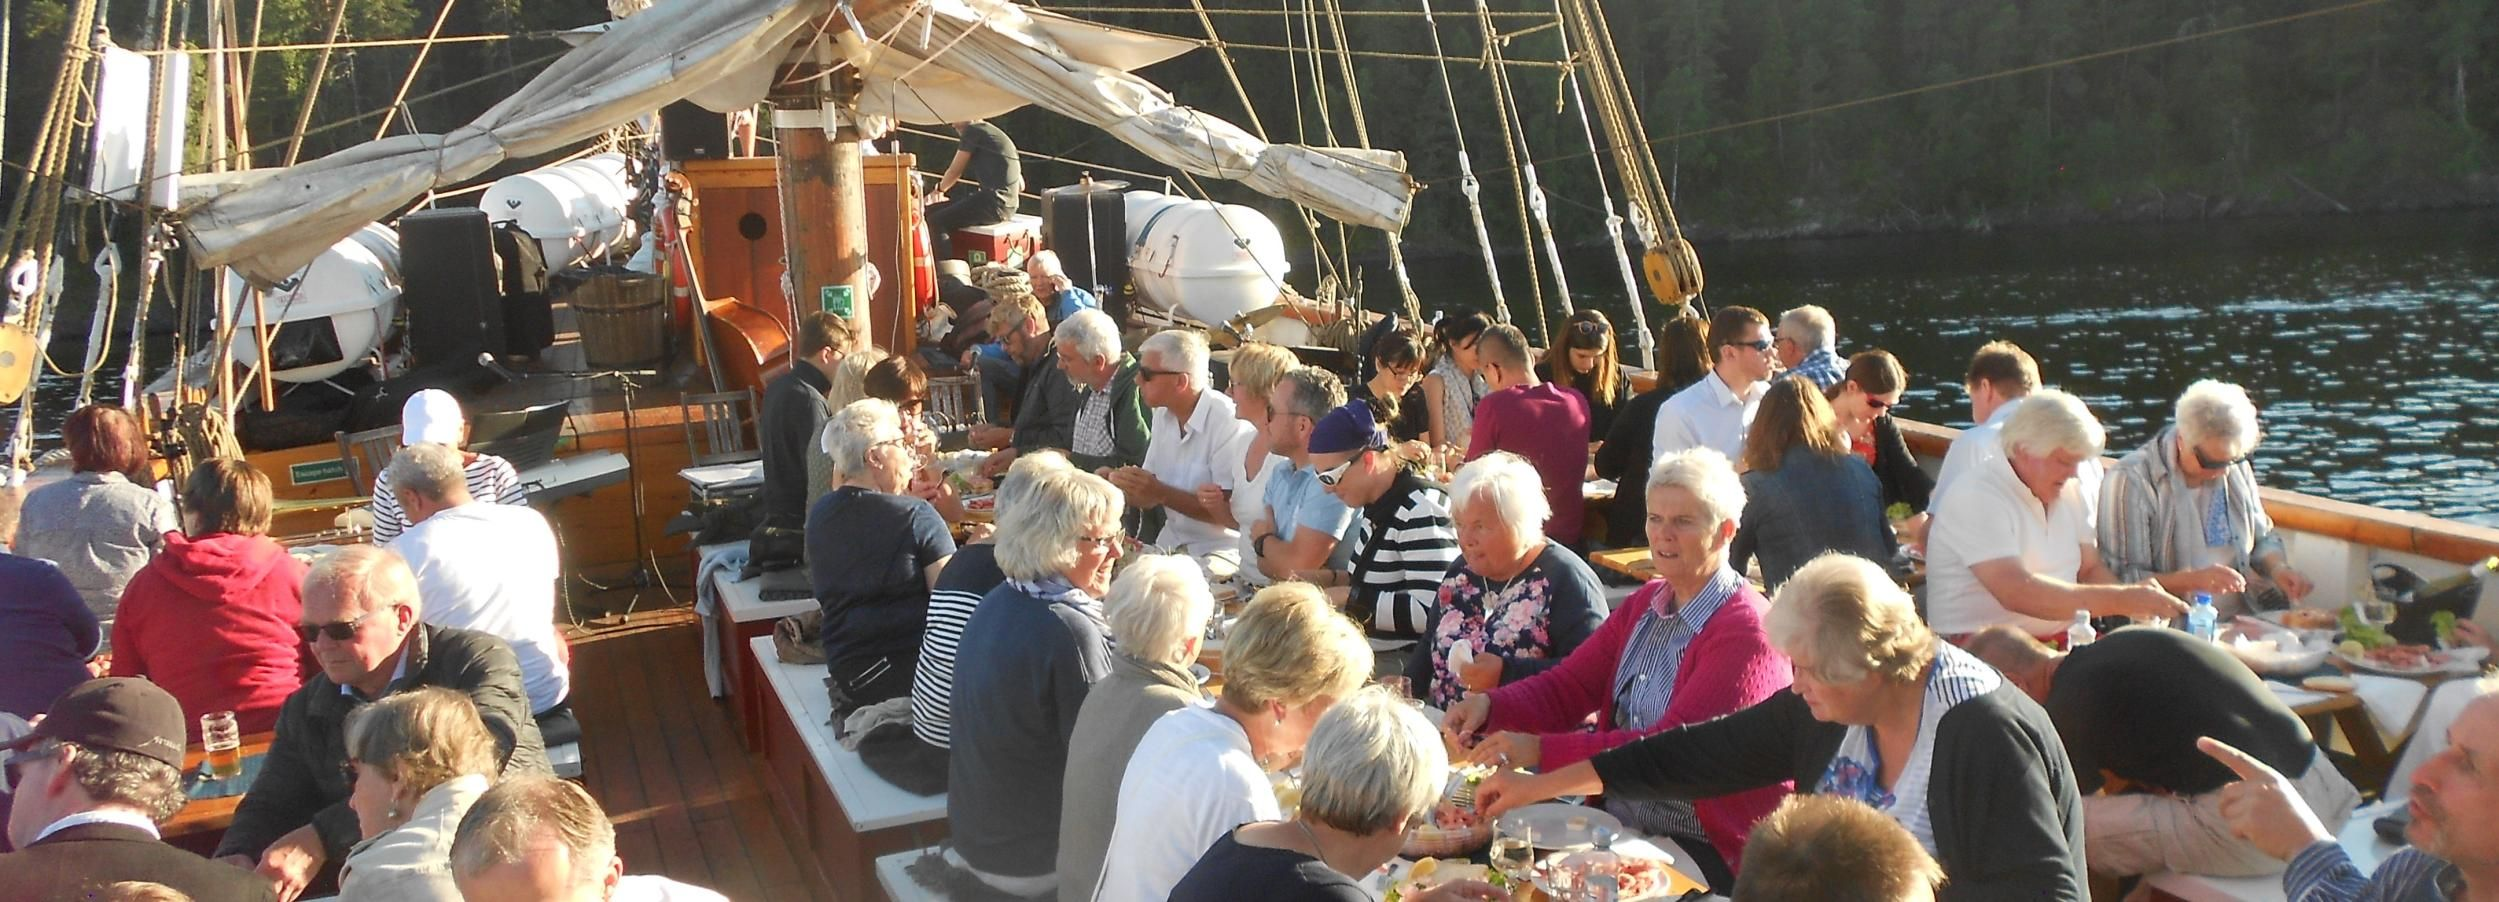 Oslos Fjorde: 3-stündige Bootsfahrt am Abend mit Buffet